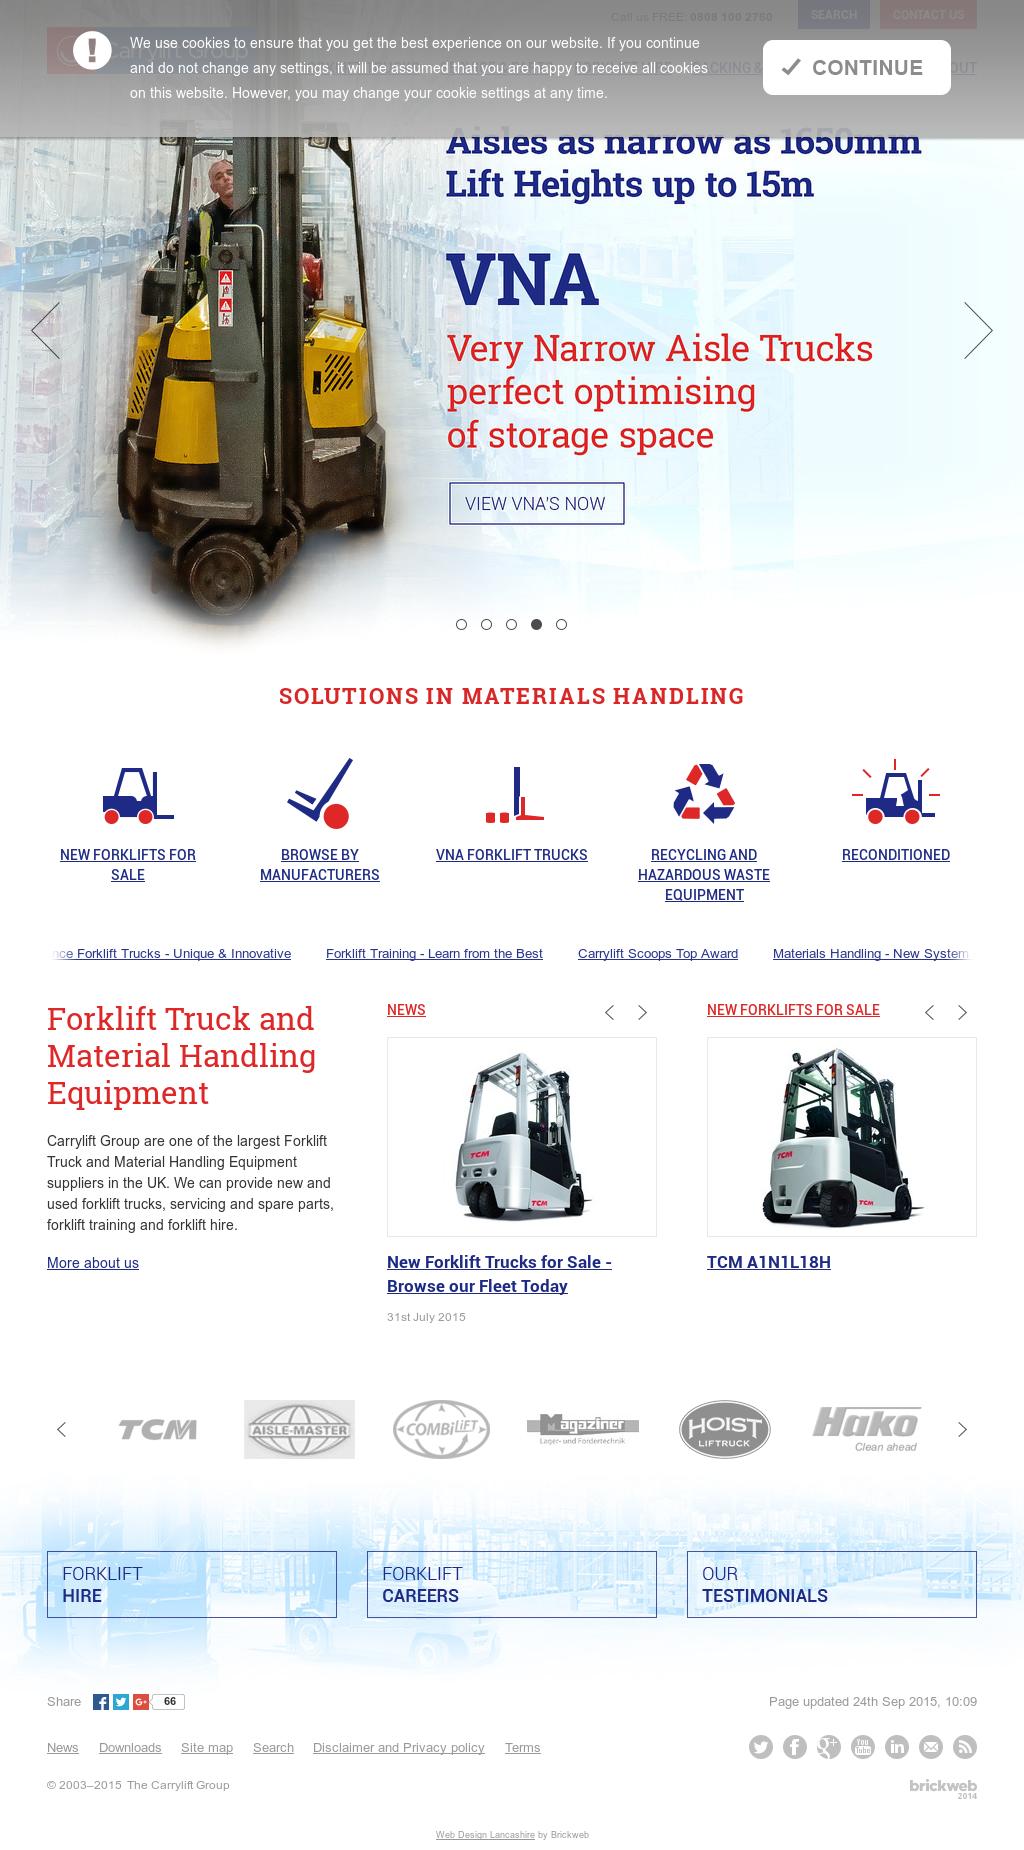 Carrylift Materials Handling Competitors, Revenue and